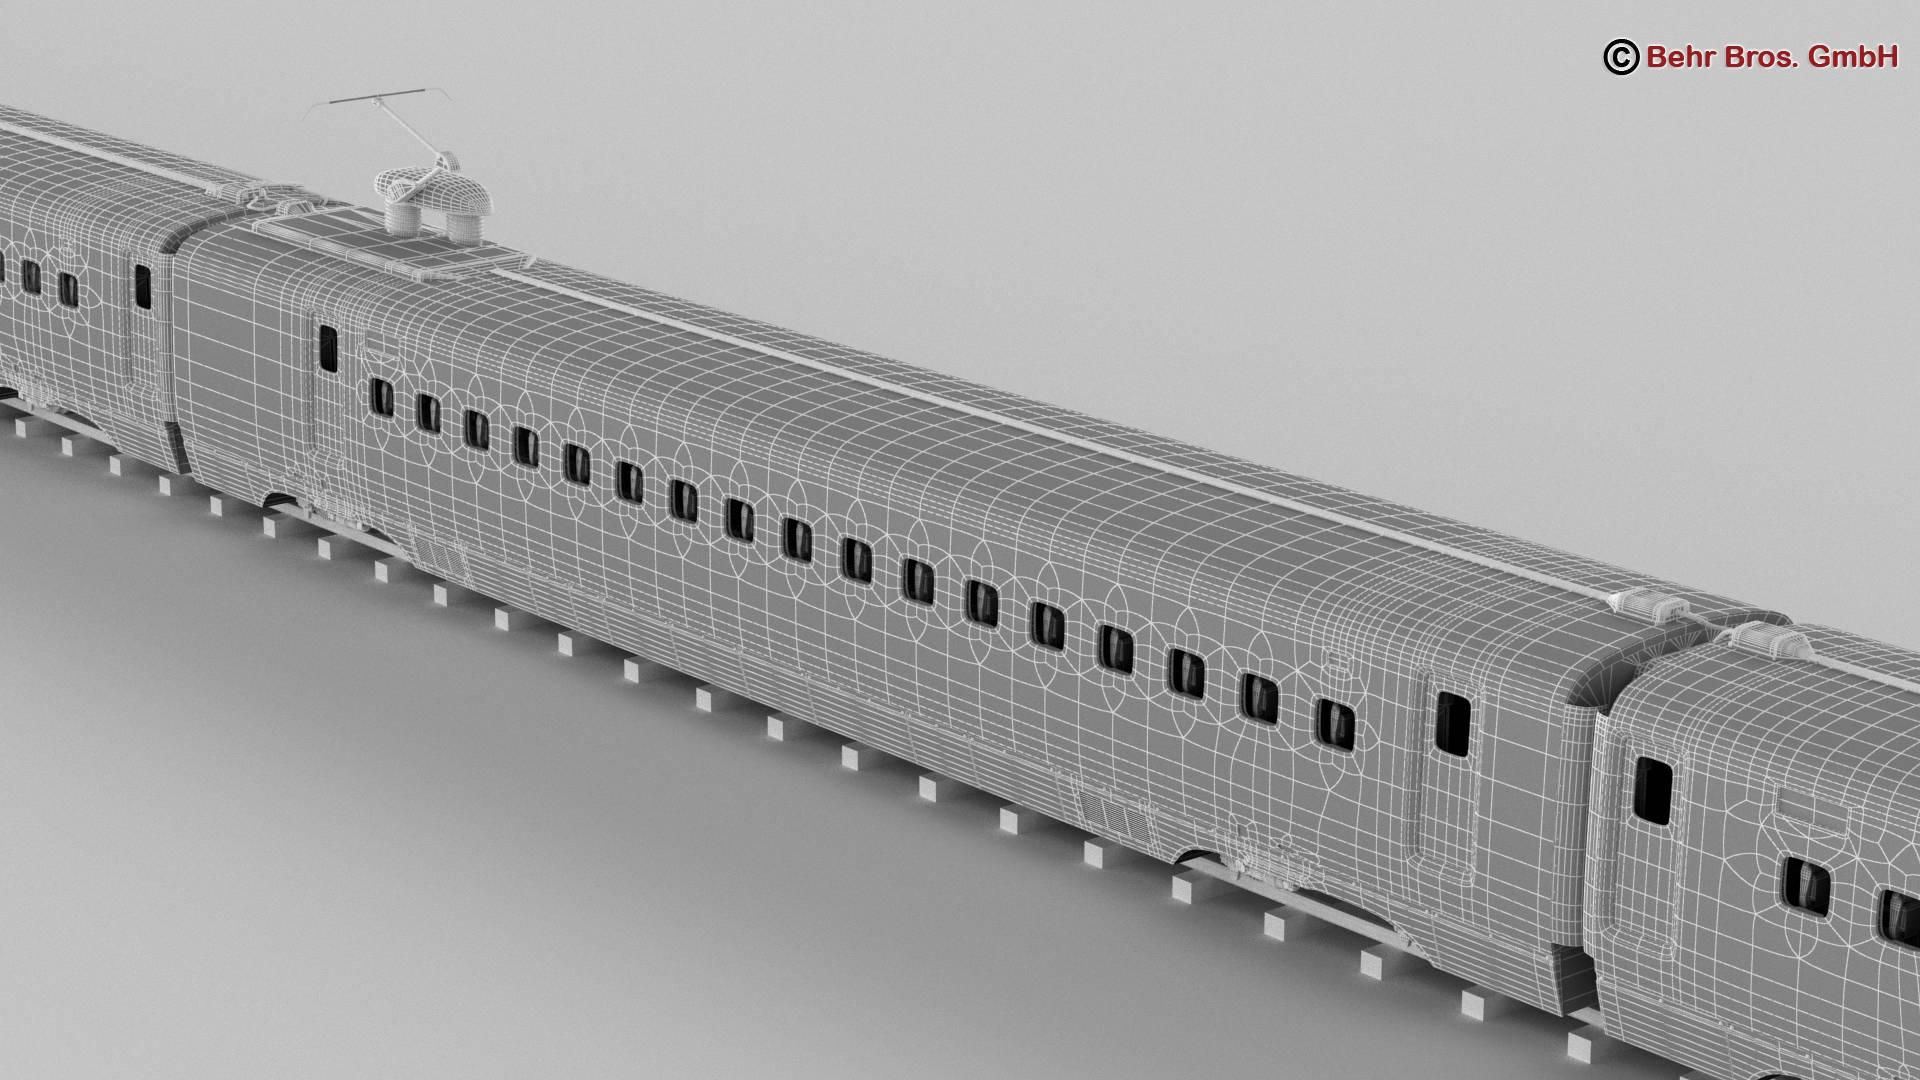 shinkansen e7 3d model 3ds max fbx c4d lwo ma mb obj 265674